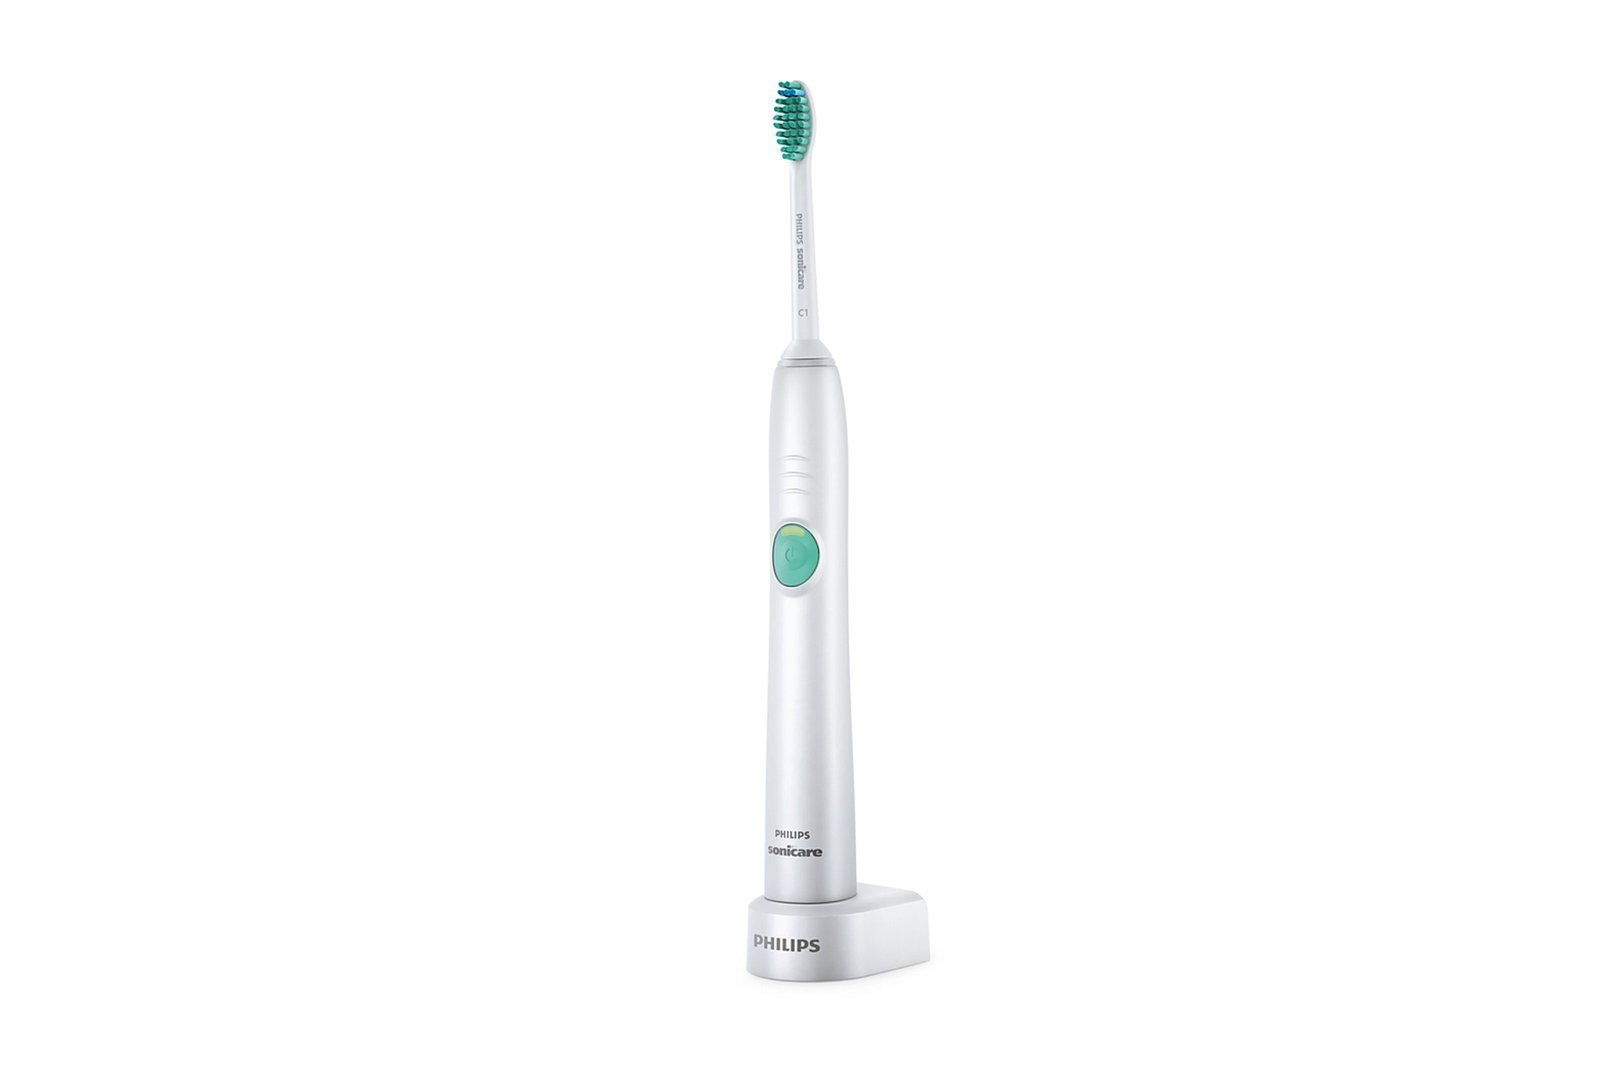 Sonic toothbrush Philips Sonicare EasyClean HX6511/22